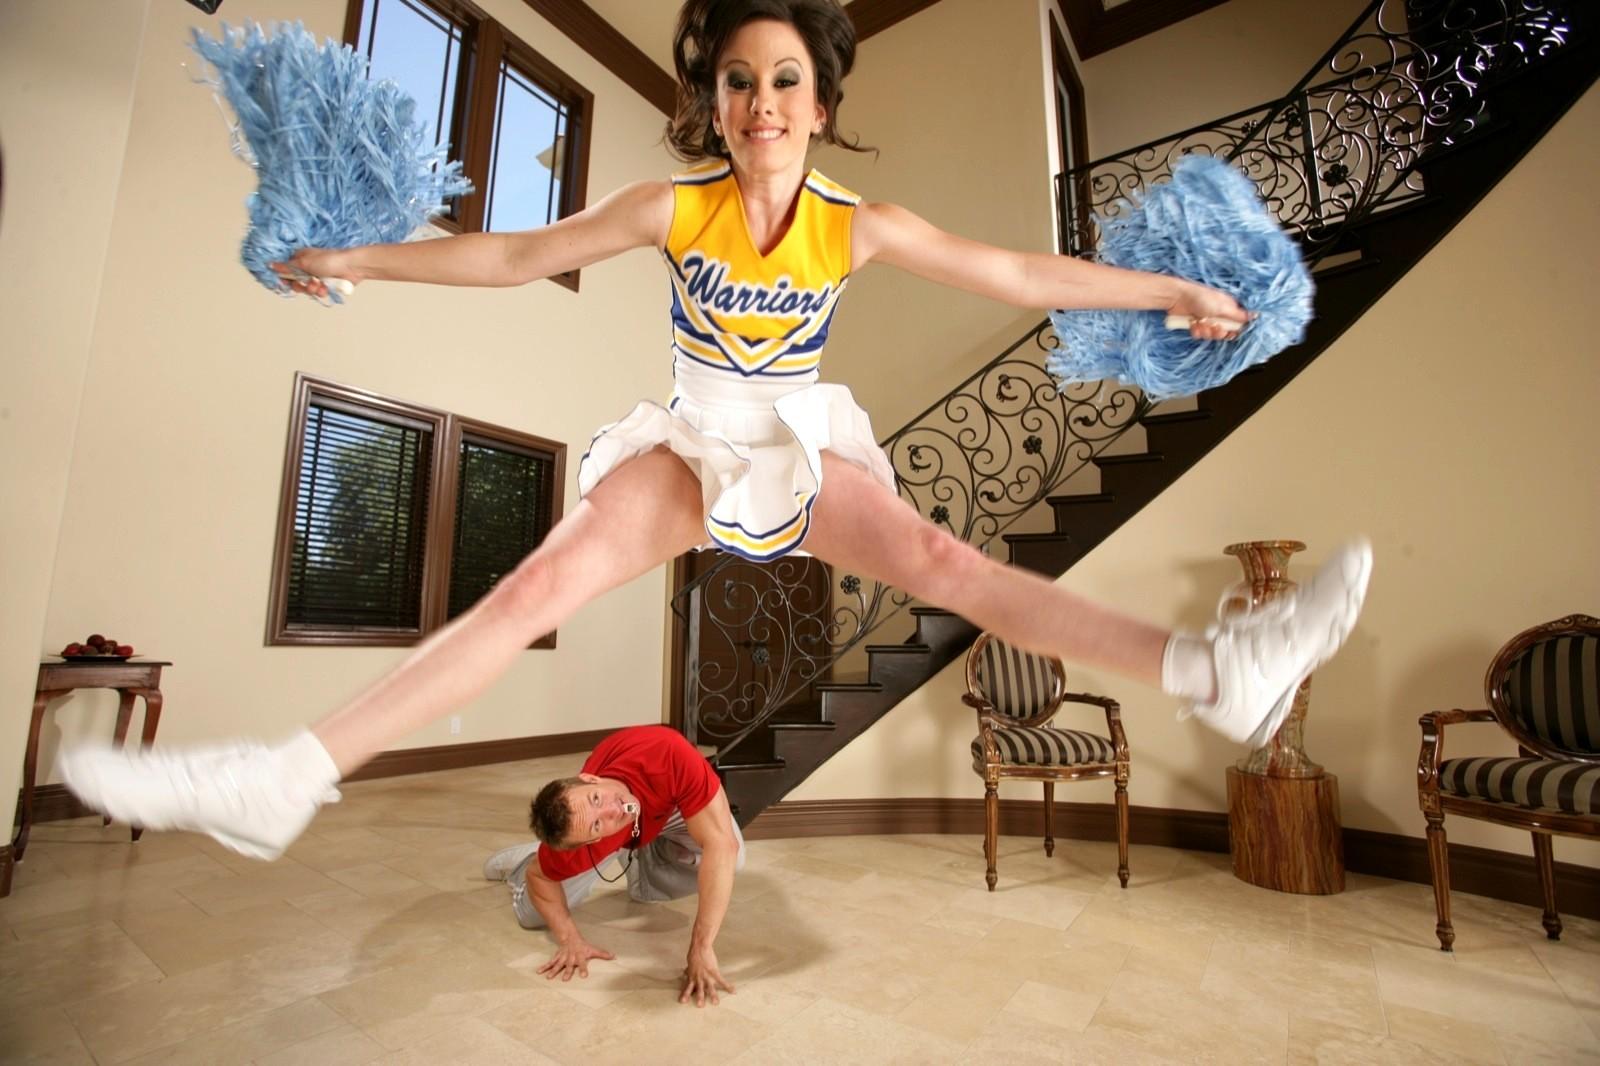 jennifer-white-cheerleader-gif